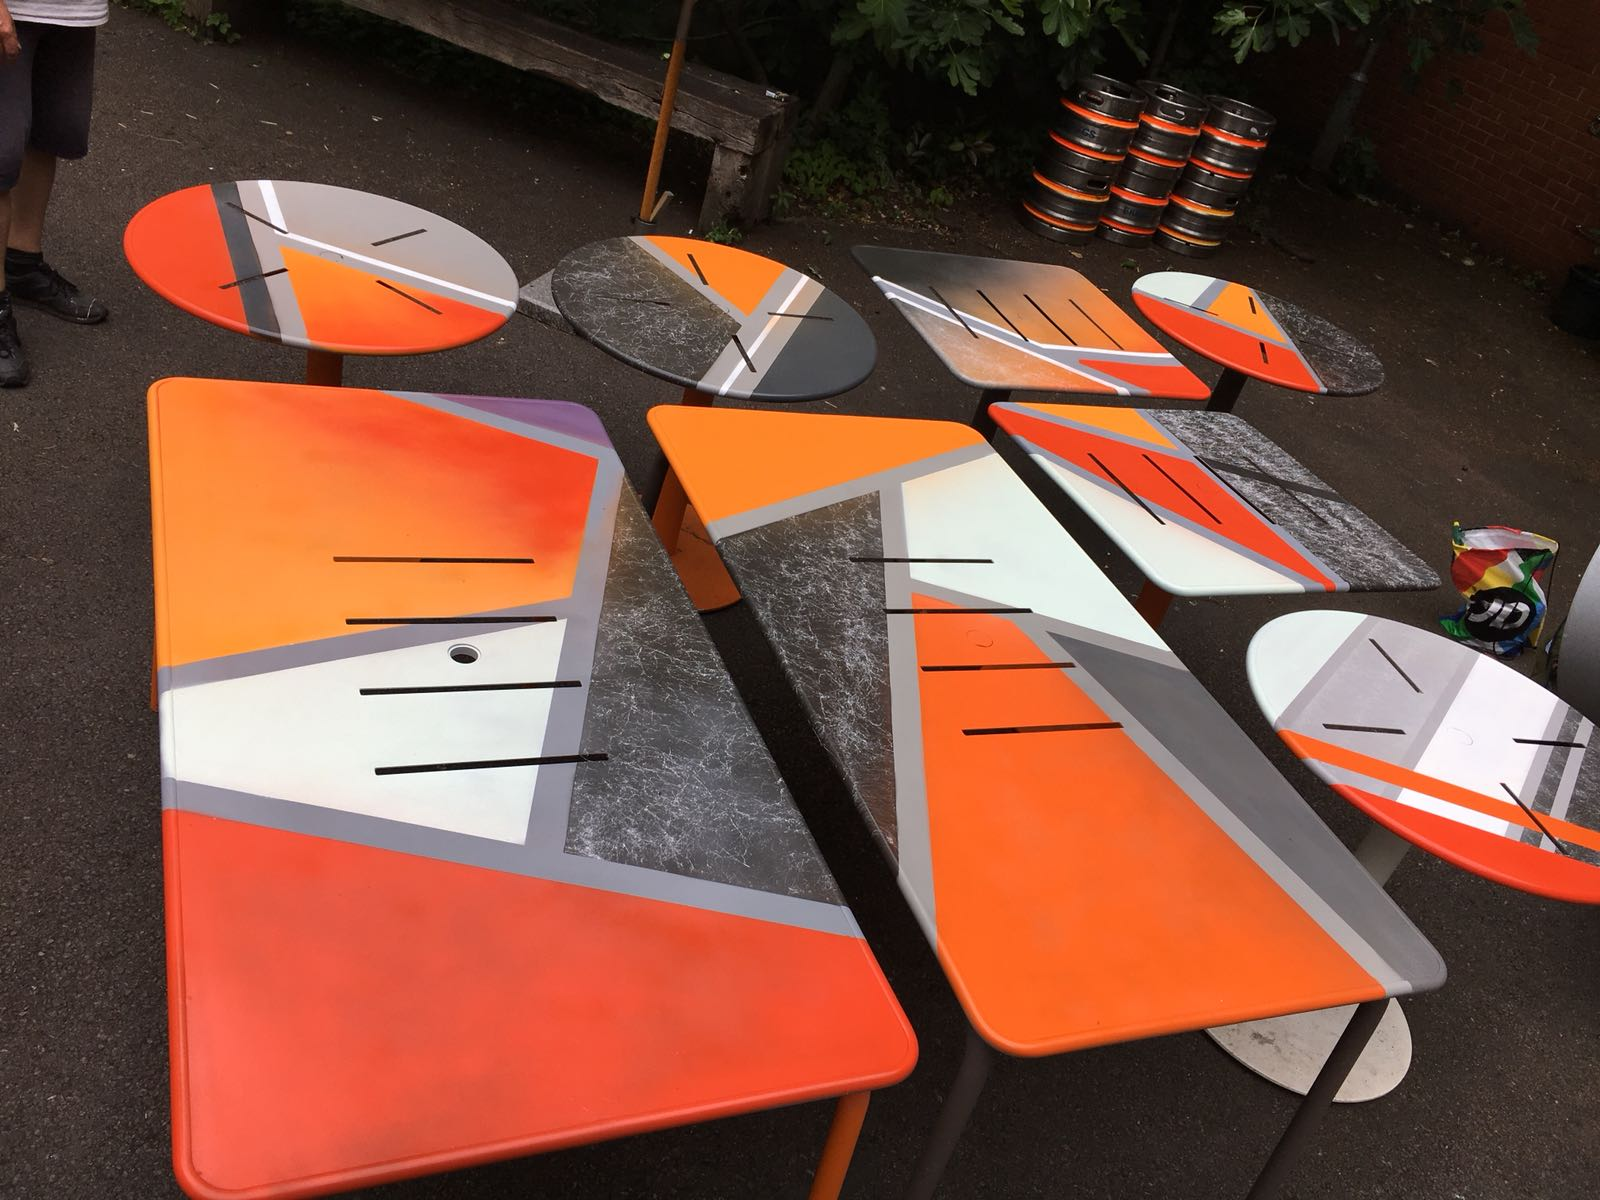 Alex Rubes & Graff HQ for LCB Depot